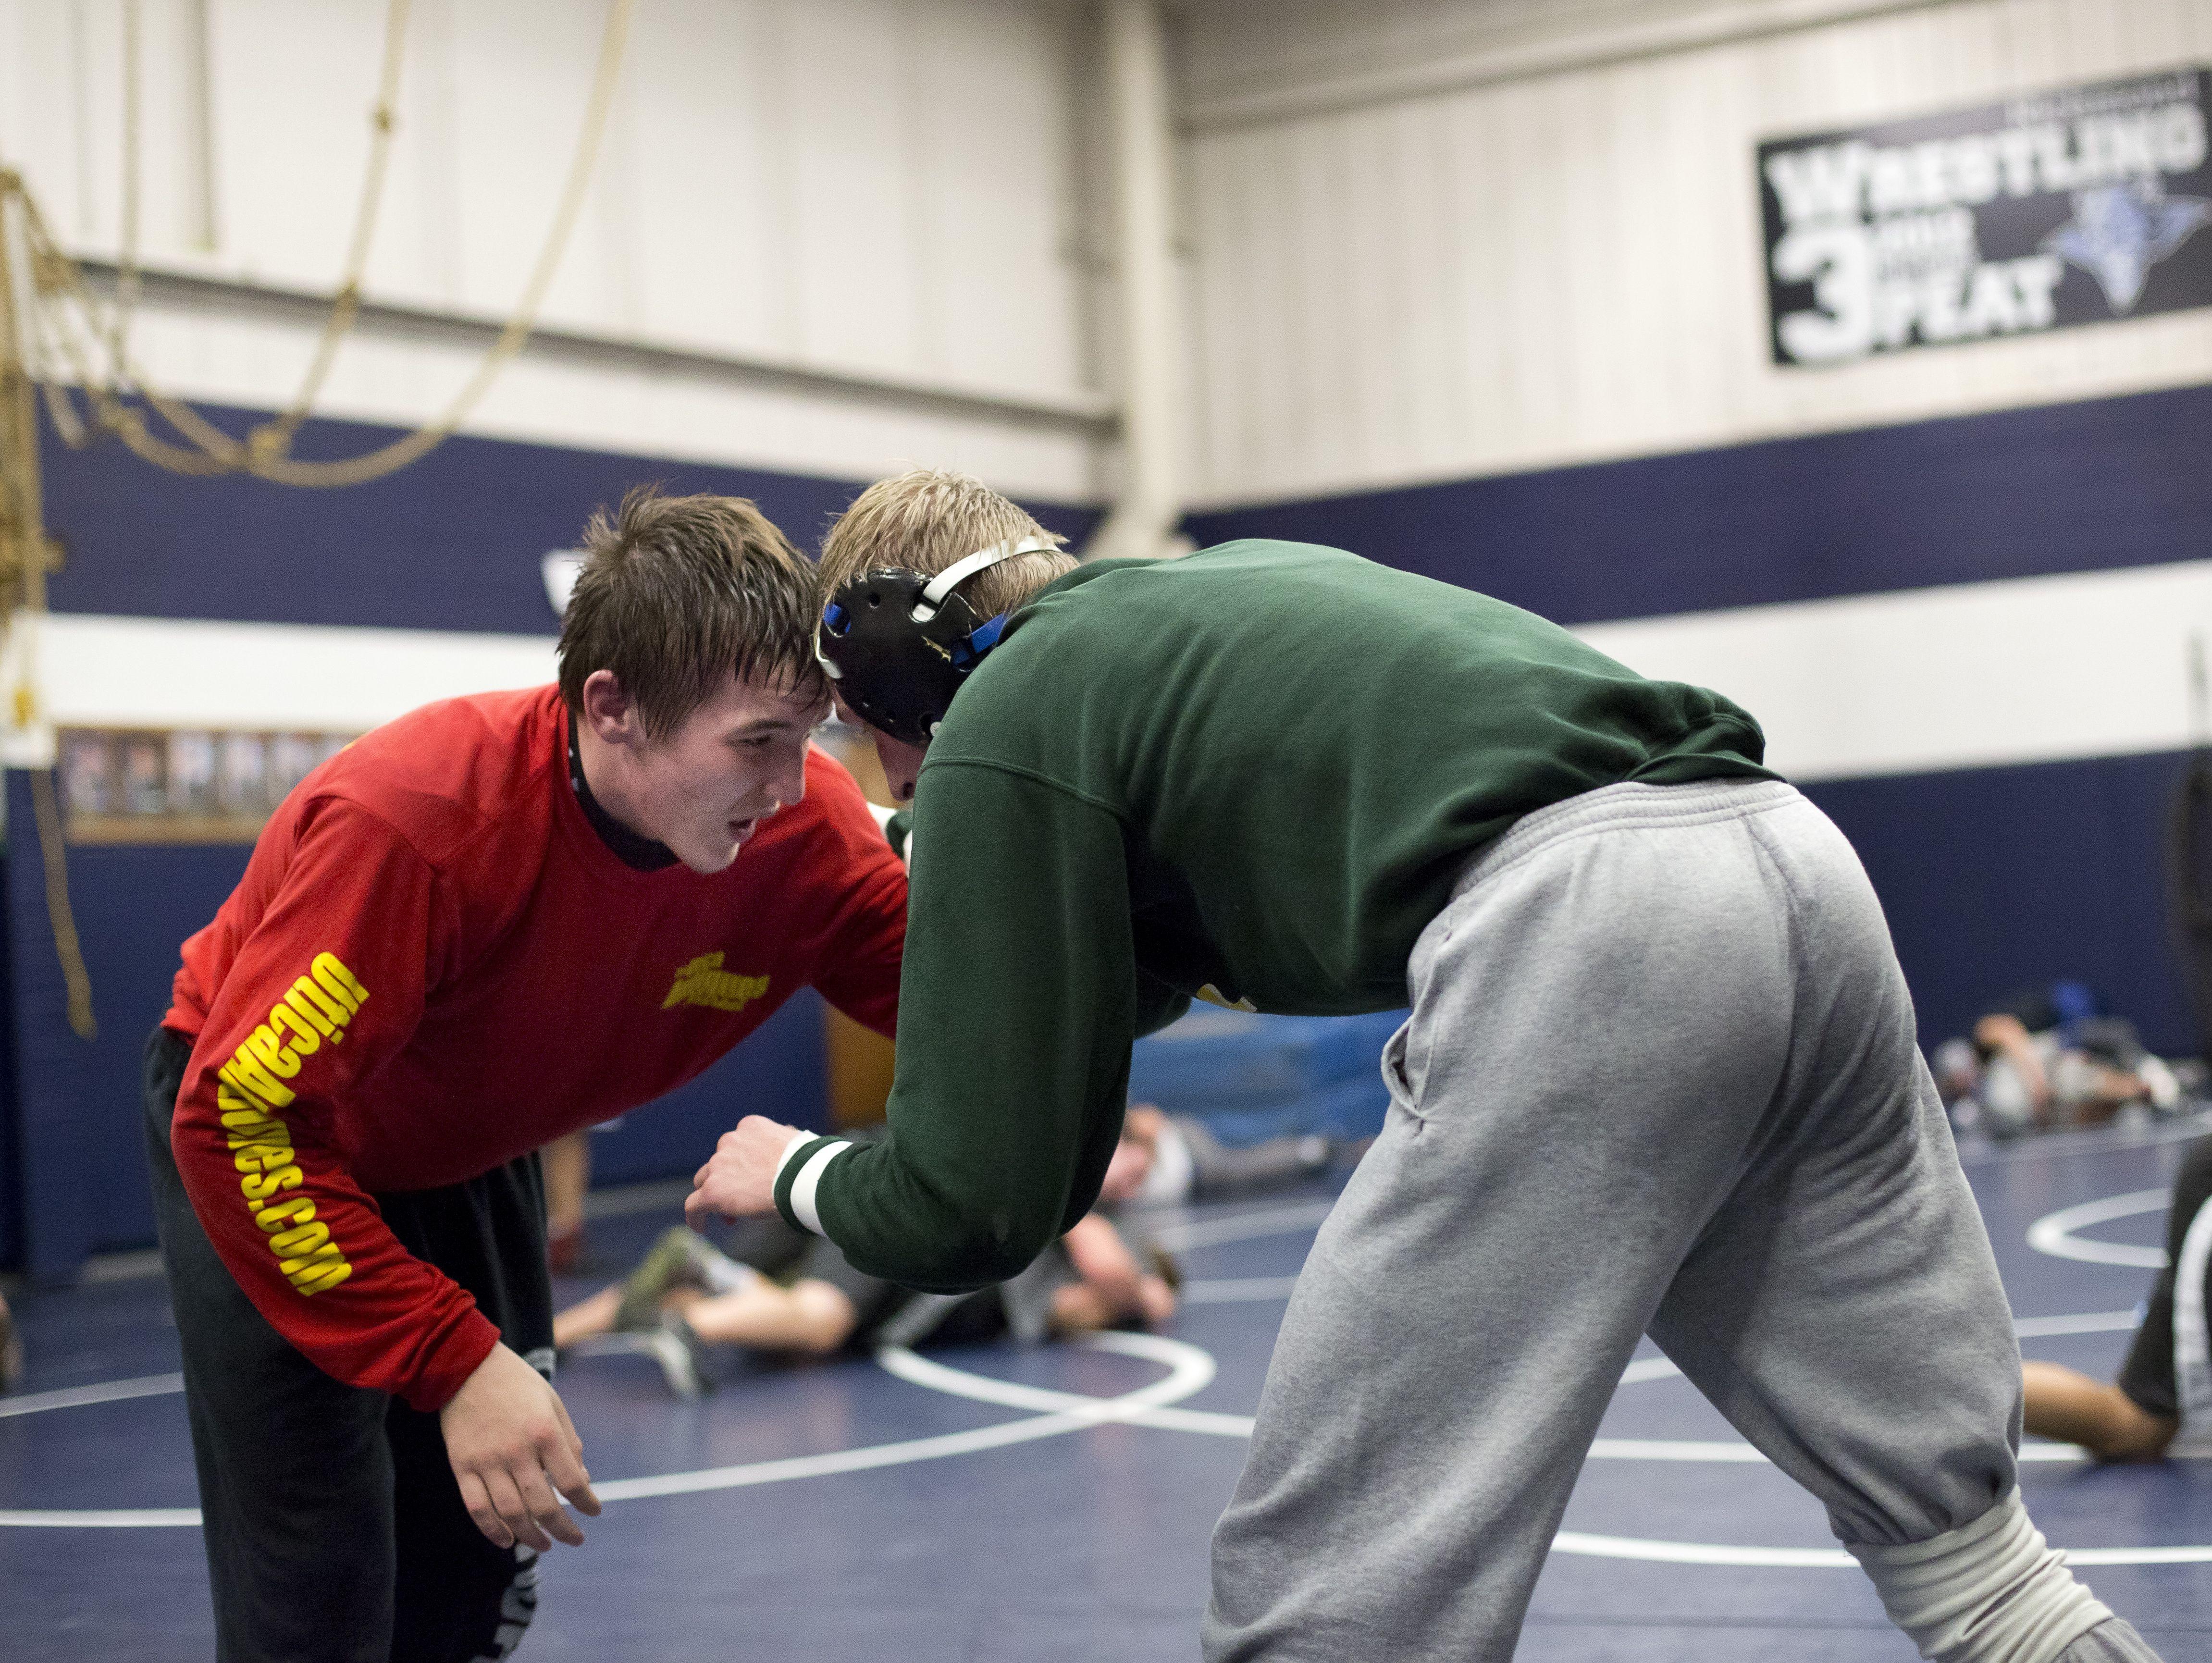 Richmond freshman Eric Barr and senior Graham Barton wrestle during wrestling practice Friday, Dec. 4, 2015 at Richmond High School.